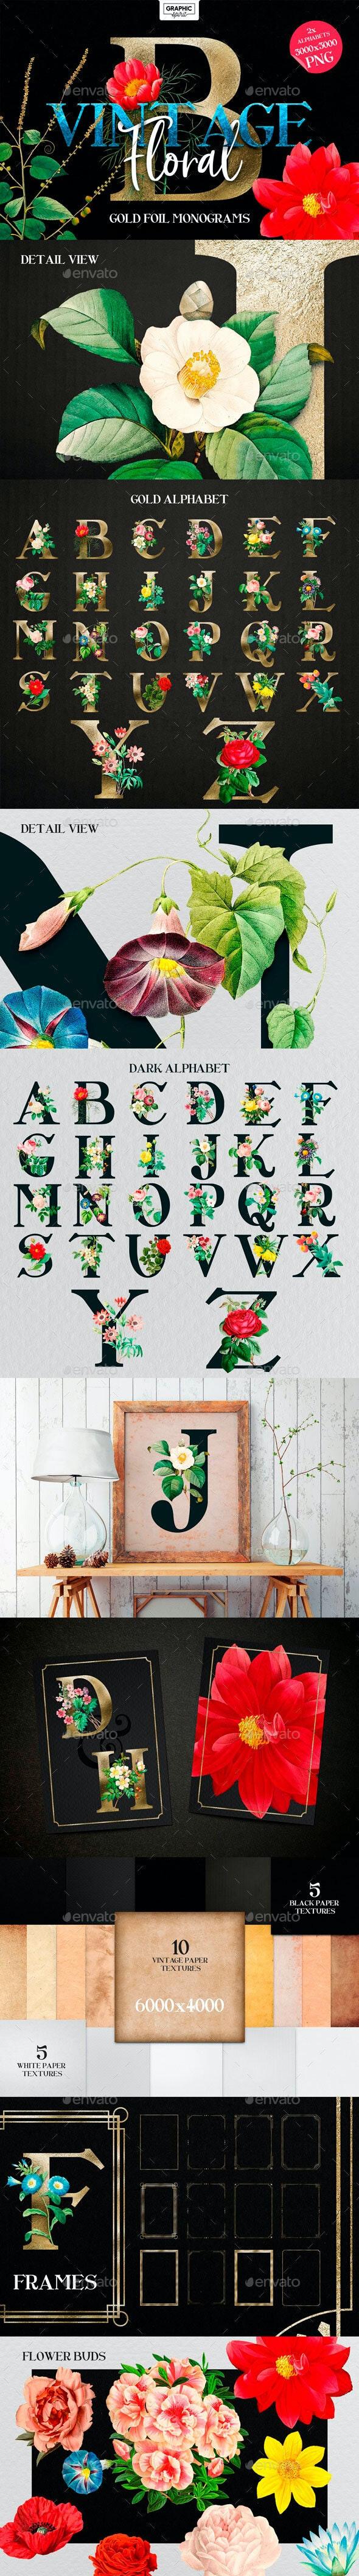 Floral Monogram Alphabet Letters - Objects Illustrations